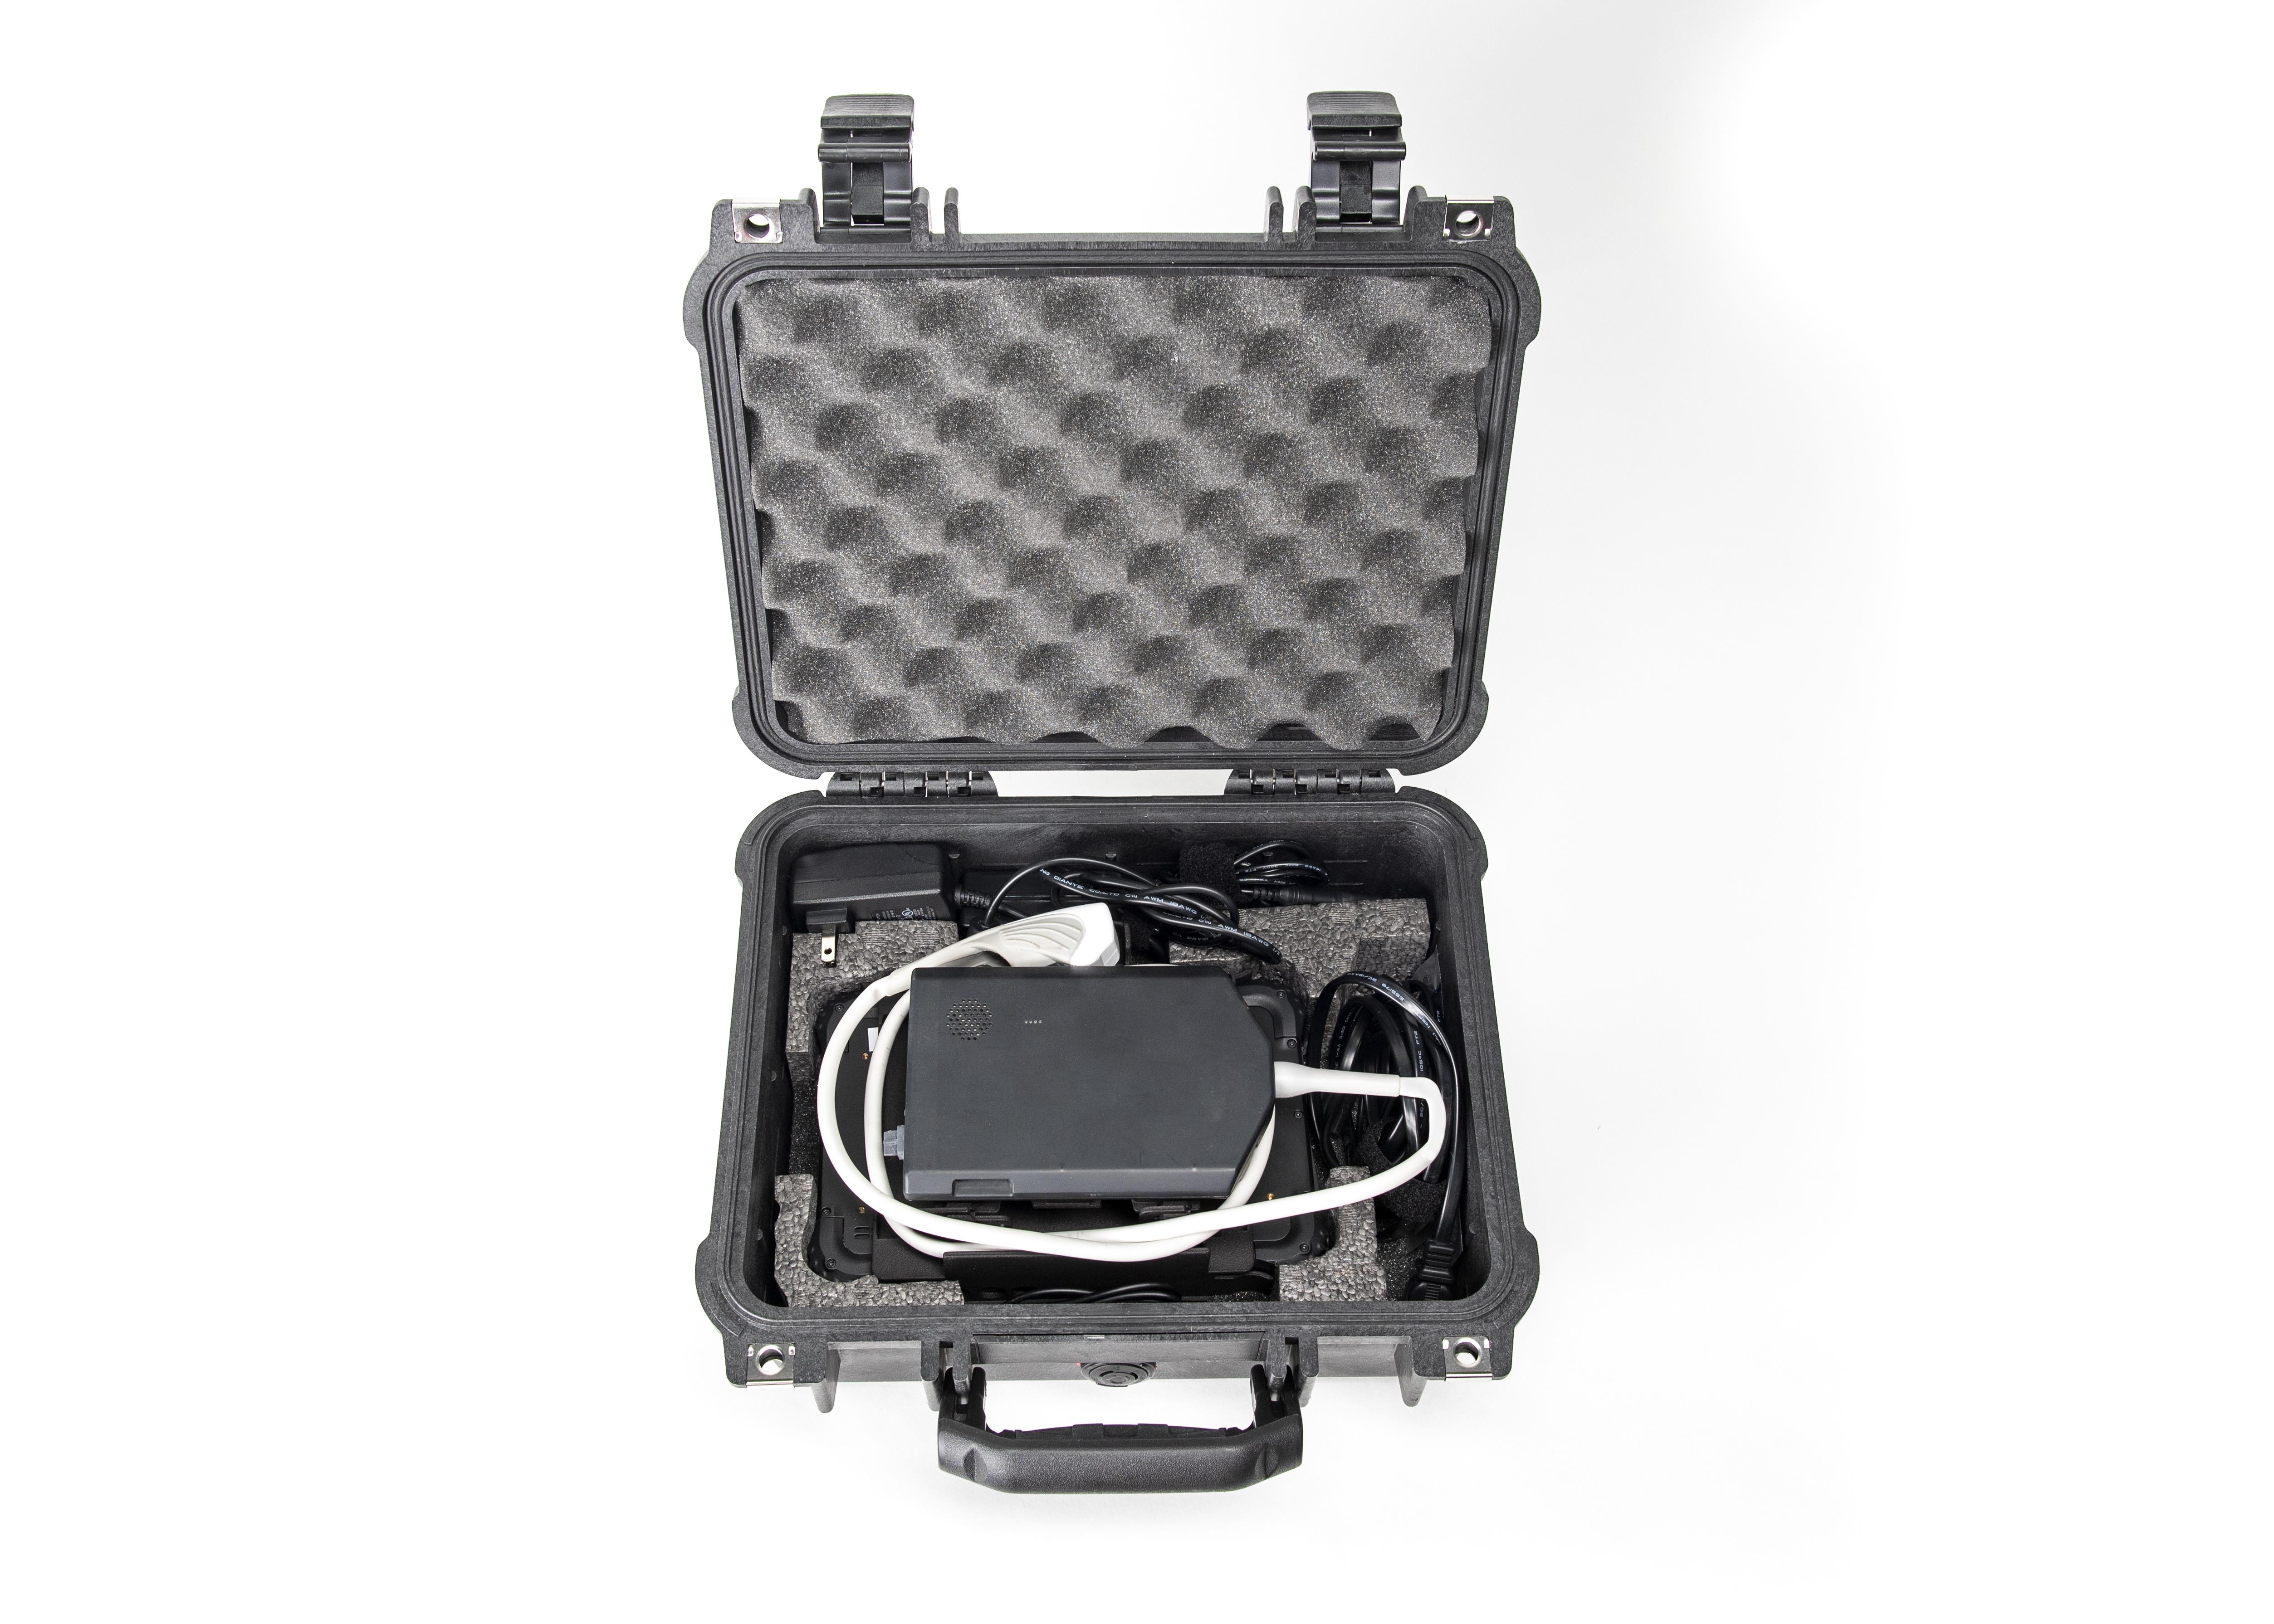 SonicEye Dual-Array Ultrasound System